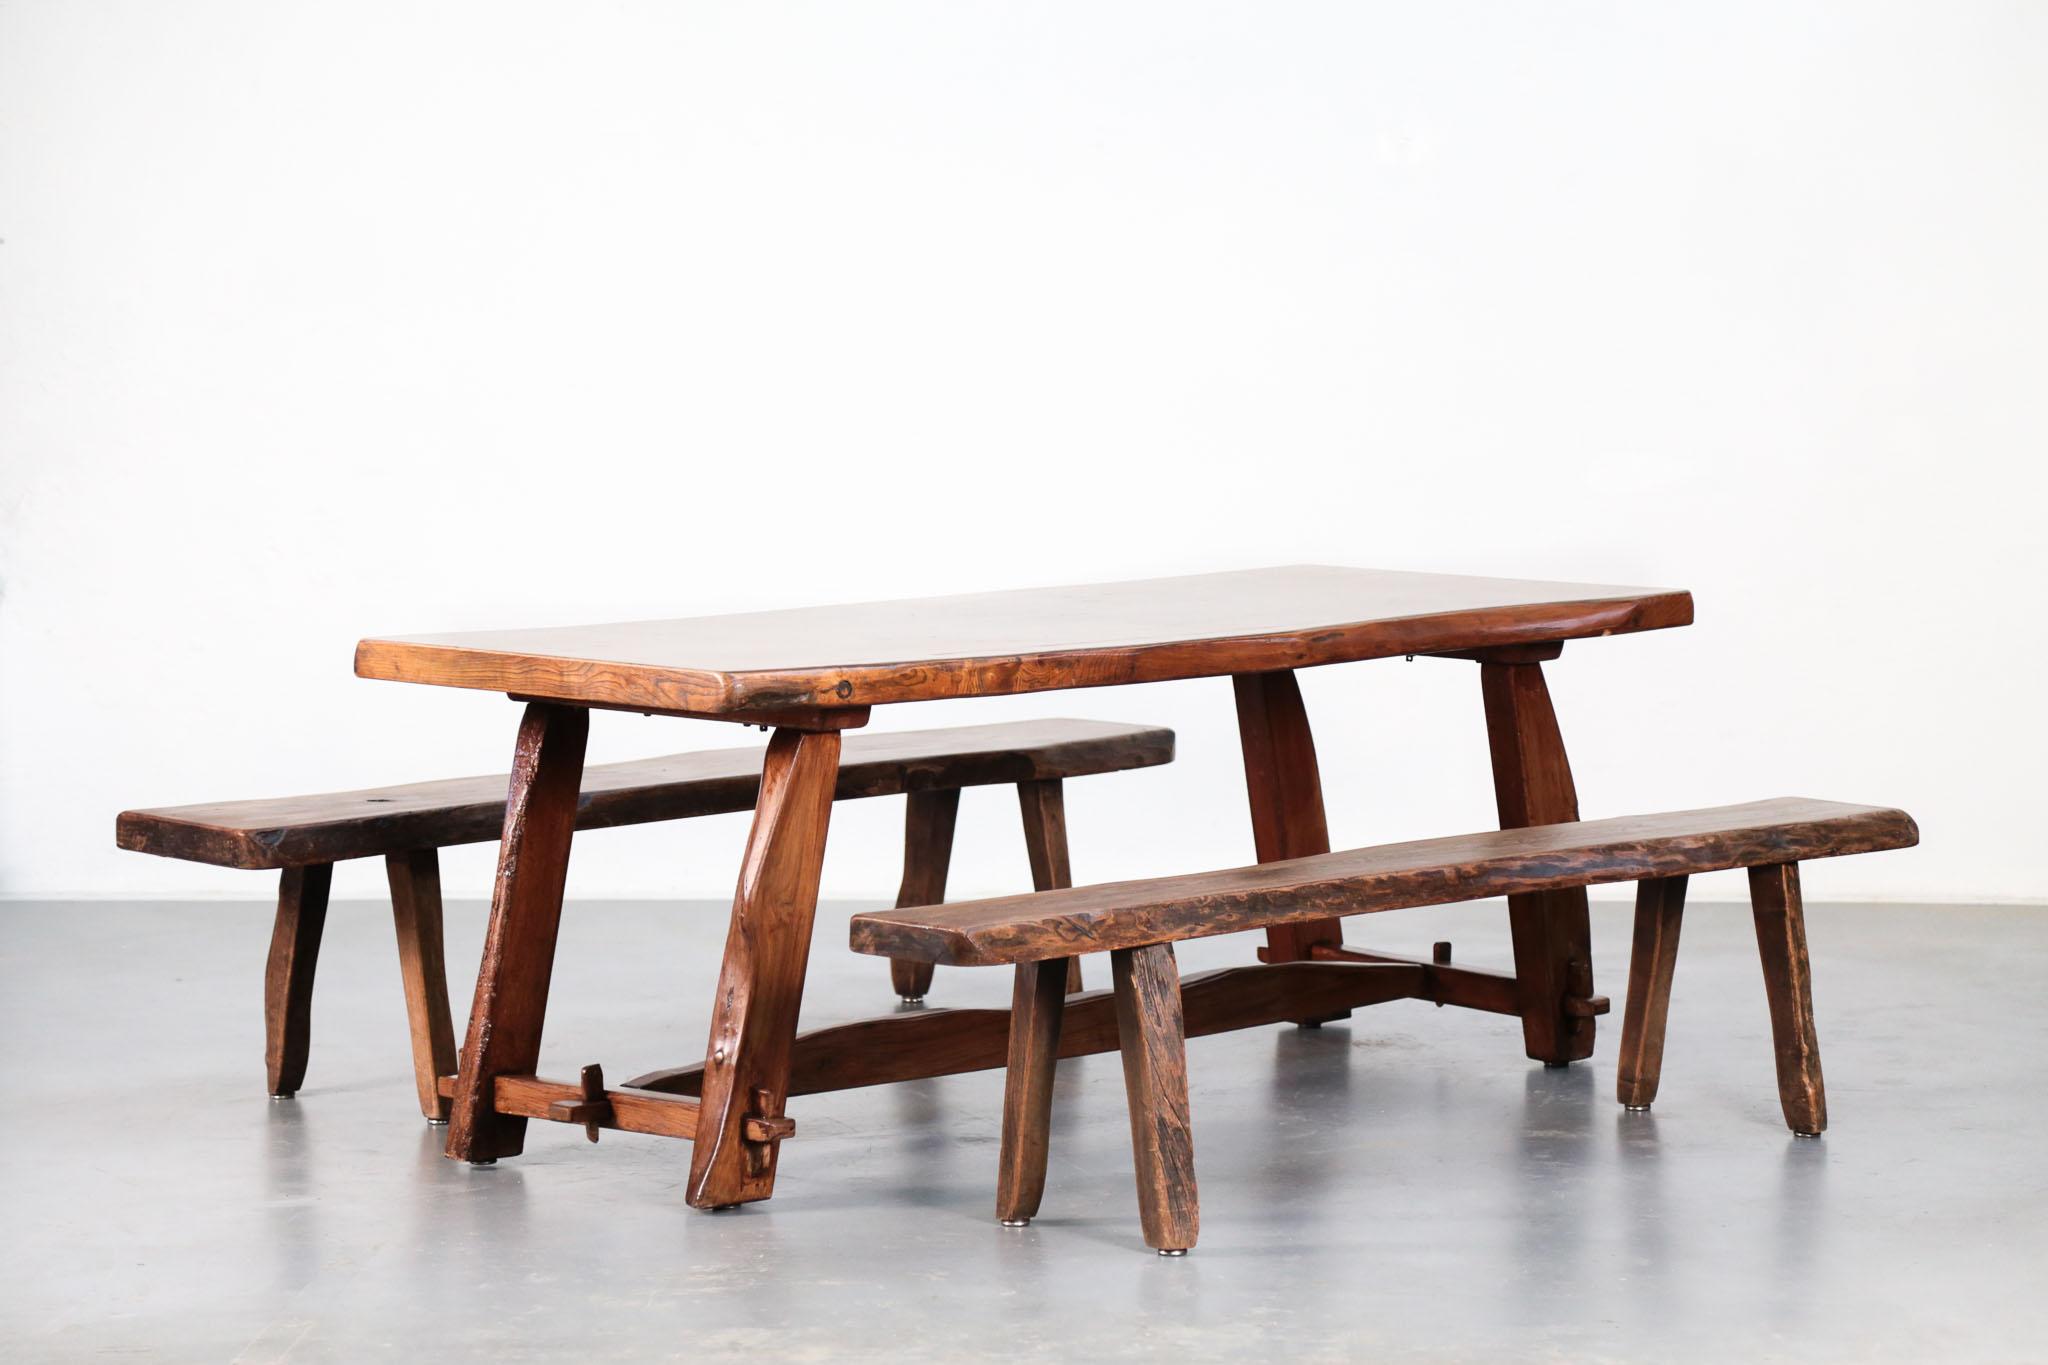 table et banc olavi hanninen buffet mikko nupponen danke. Black Bedroom Furniture Sets. Home Design Ideas